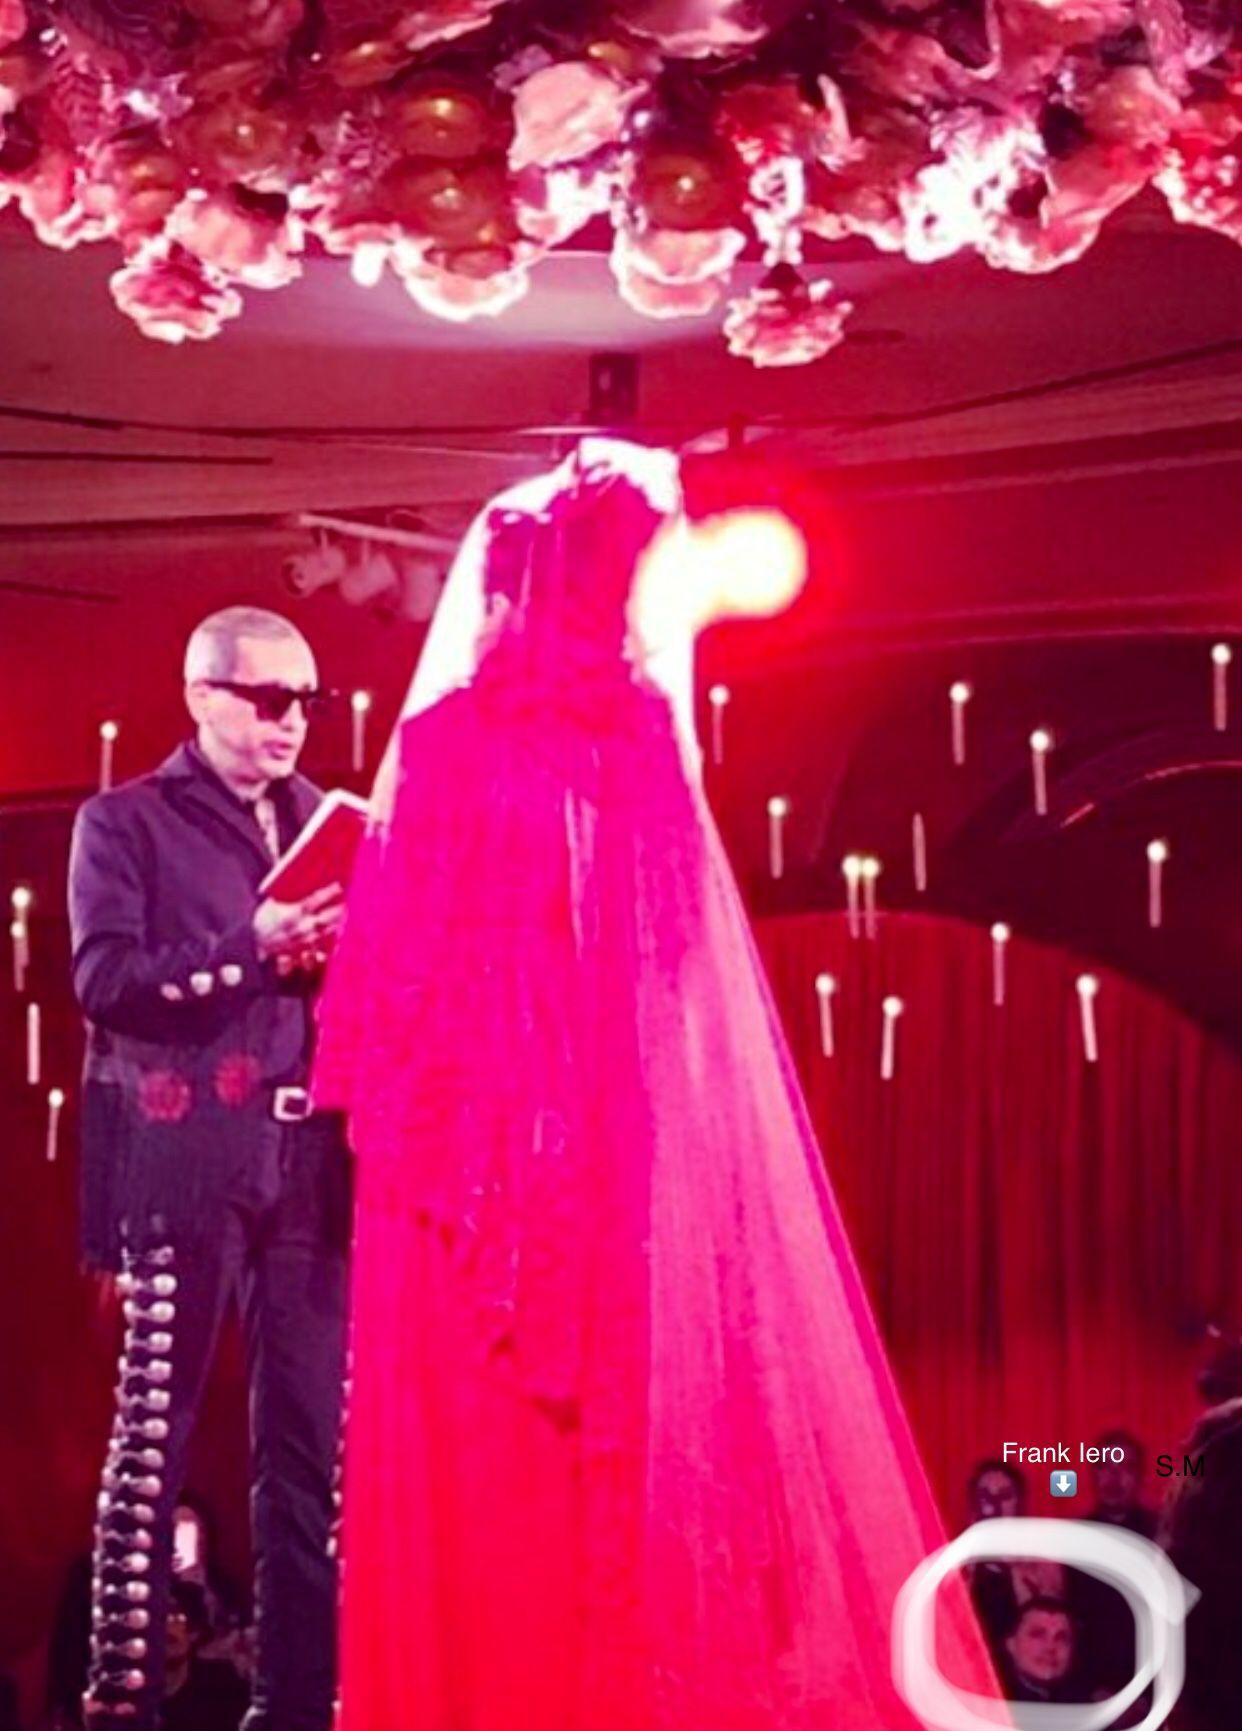 Frank Iero attending Kat Von D & Prayers Wedding 🎂🍸♥ | Kat ...